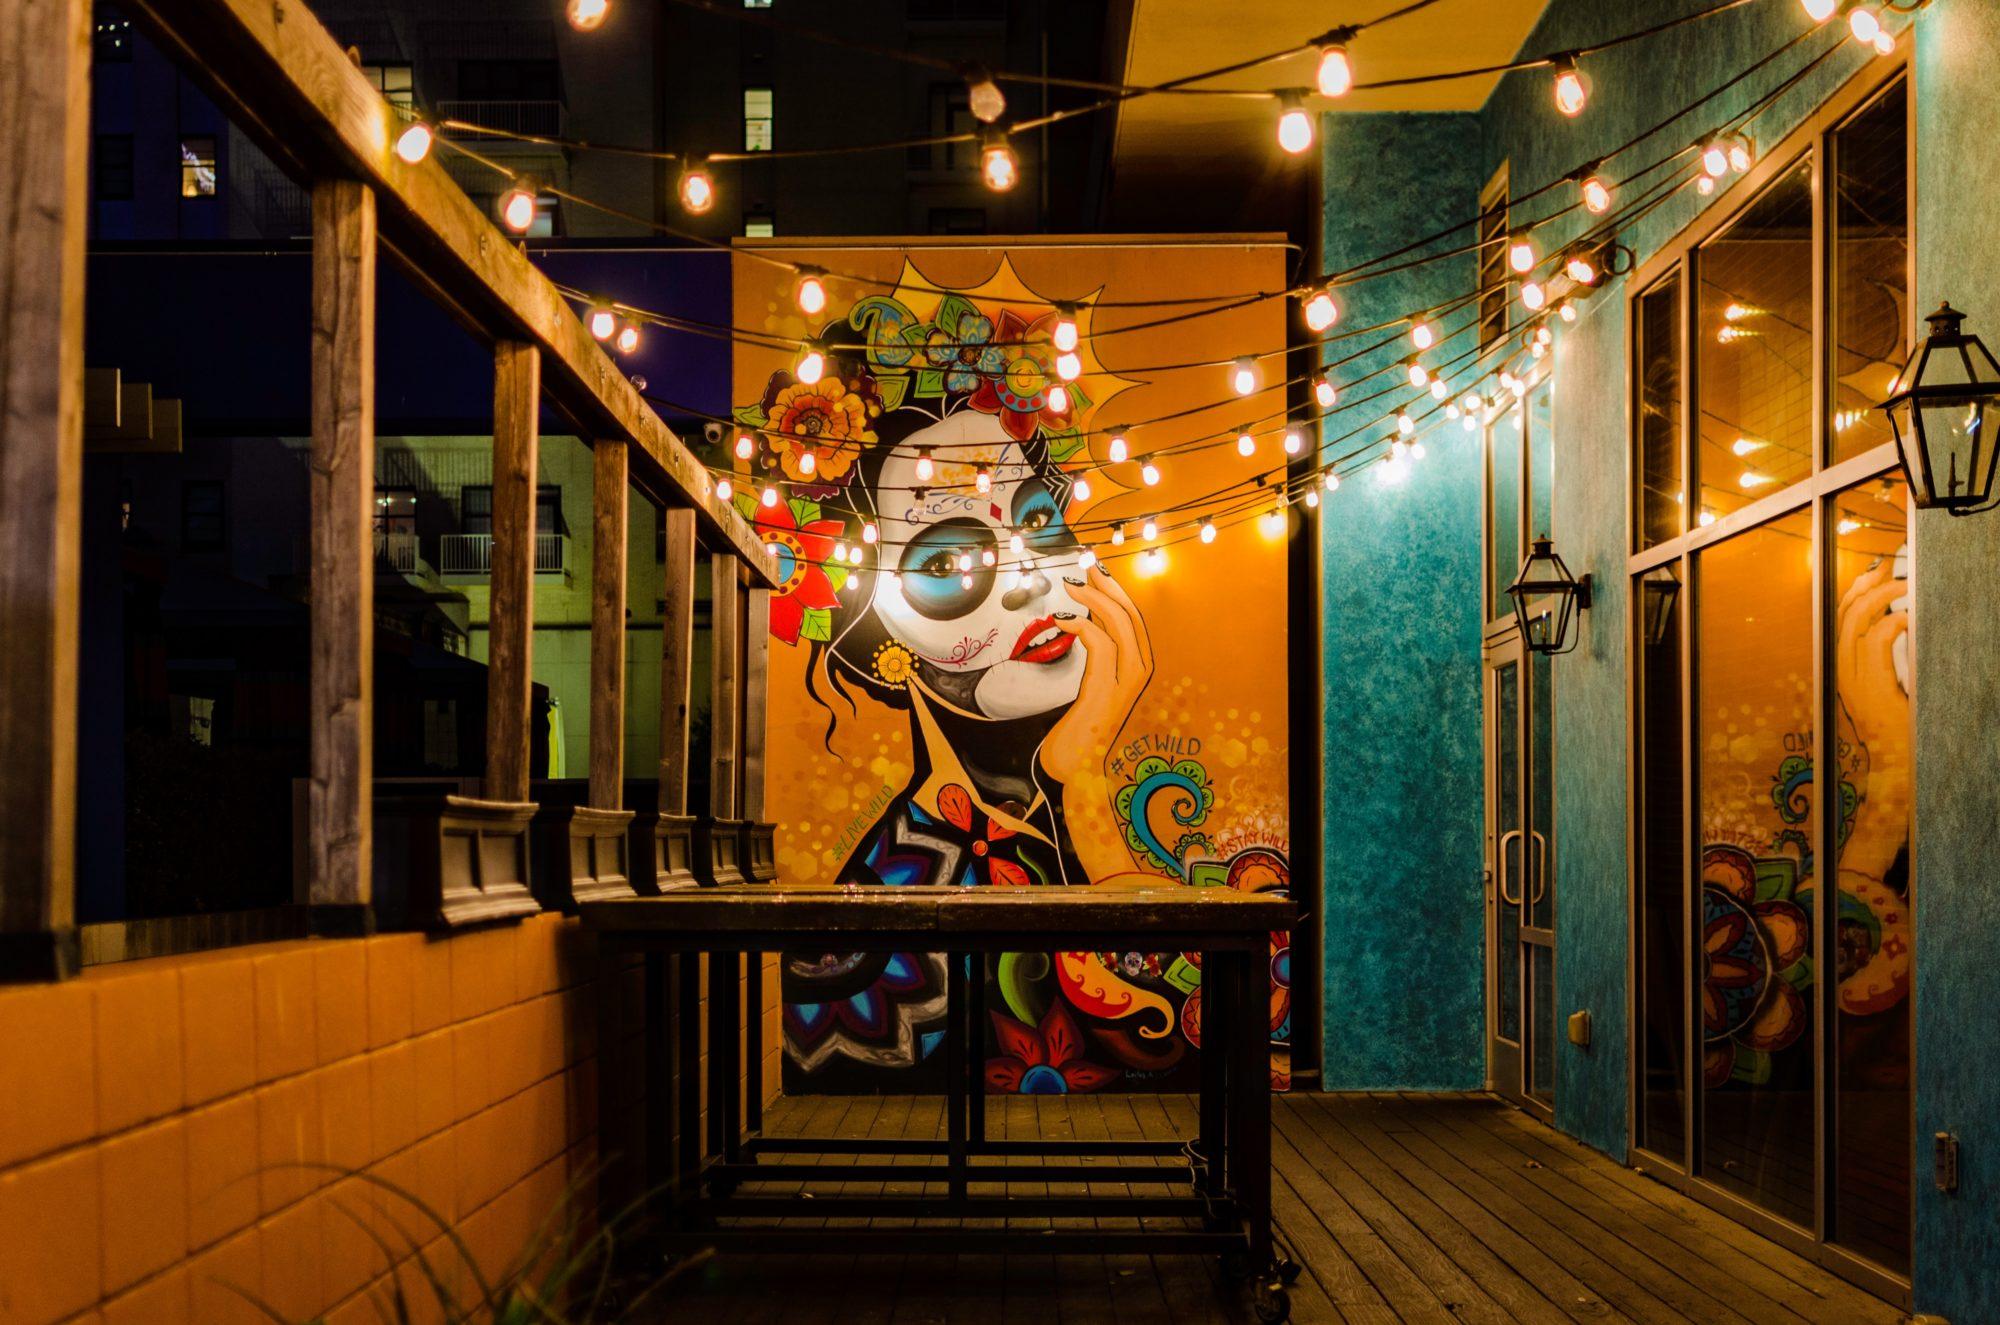 Frida Kahlo Wandbild in Dallas.